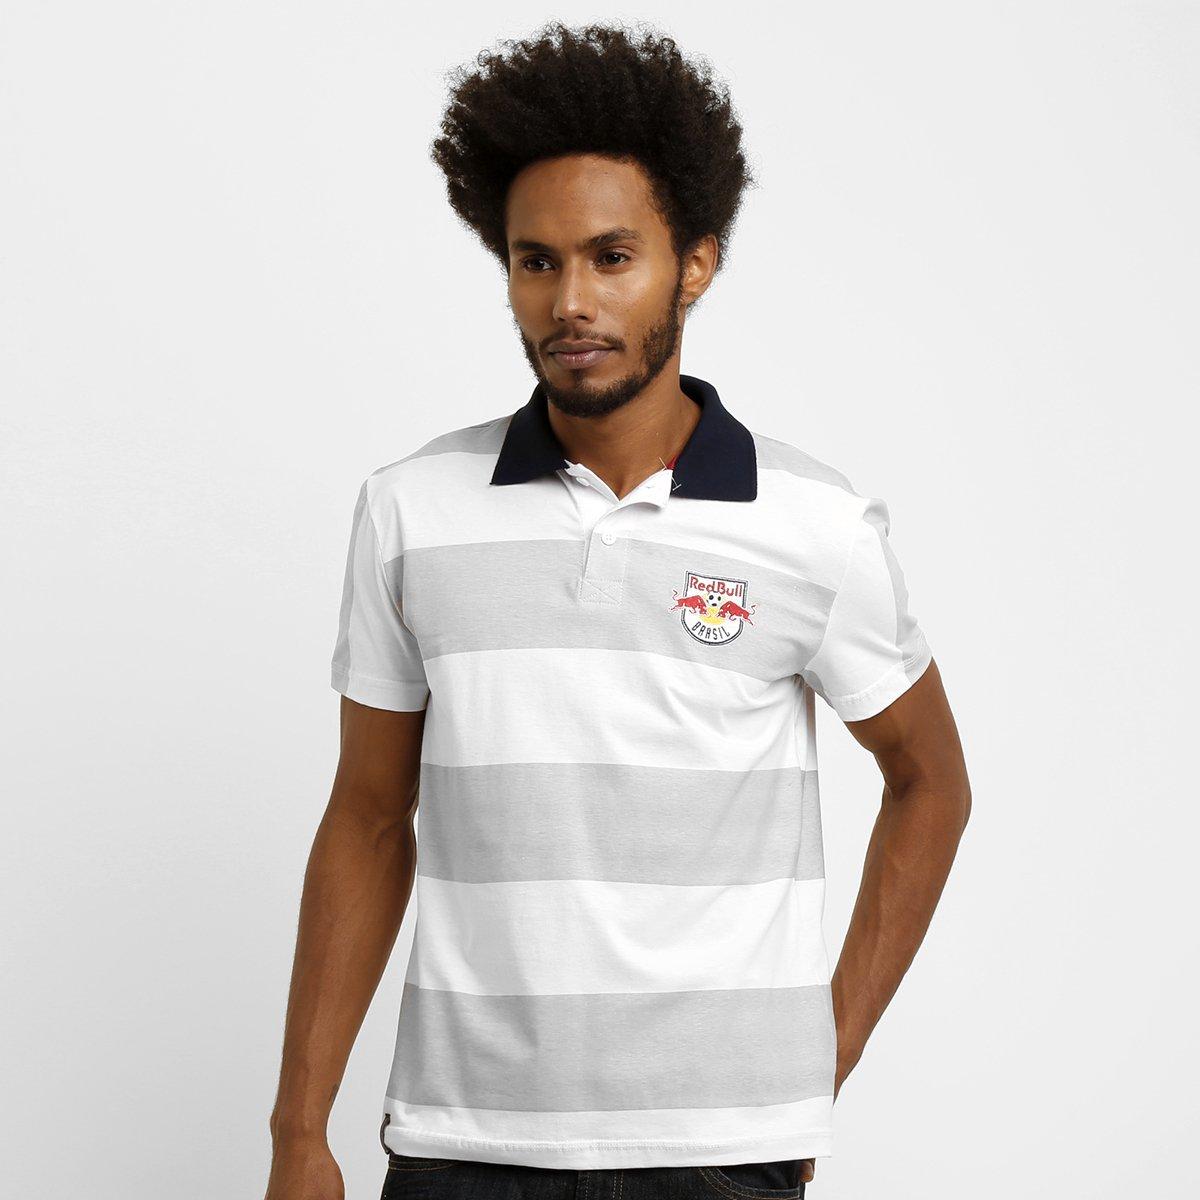 31f3f2048a8f8 Camisa Polo Red Bull Listras - Compre Agora